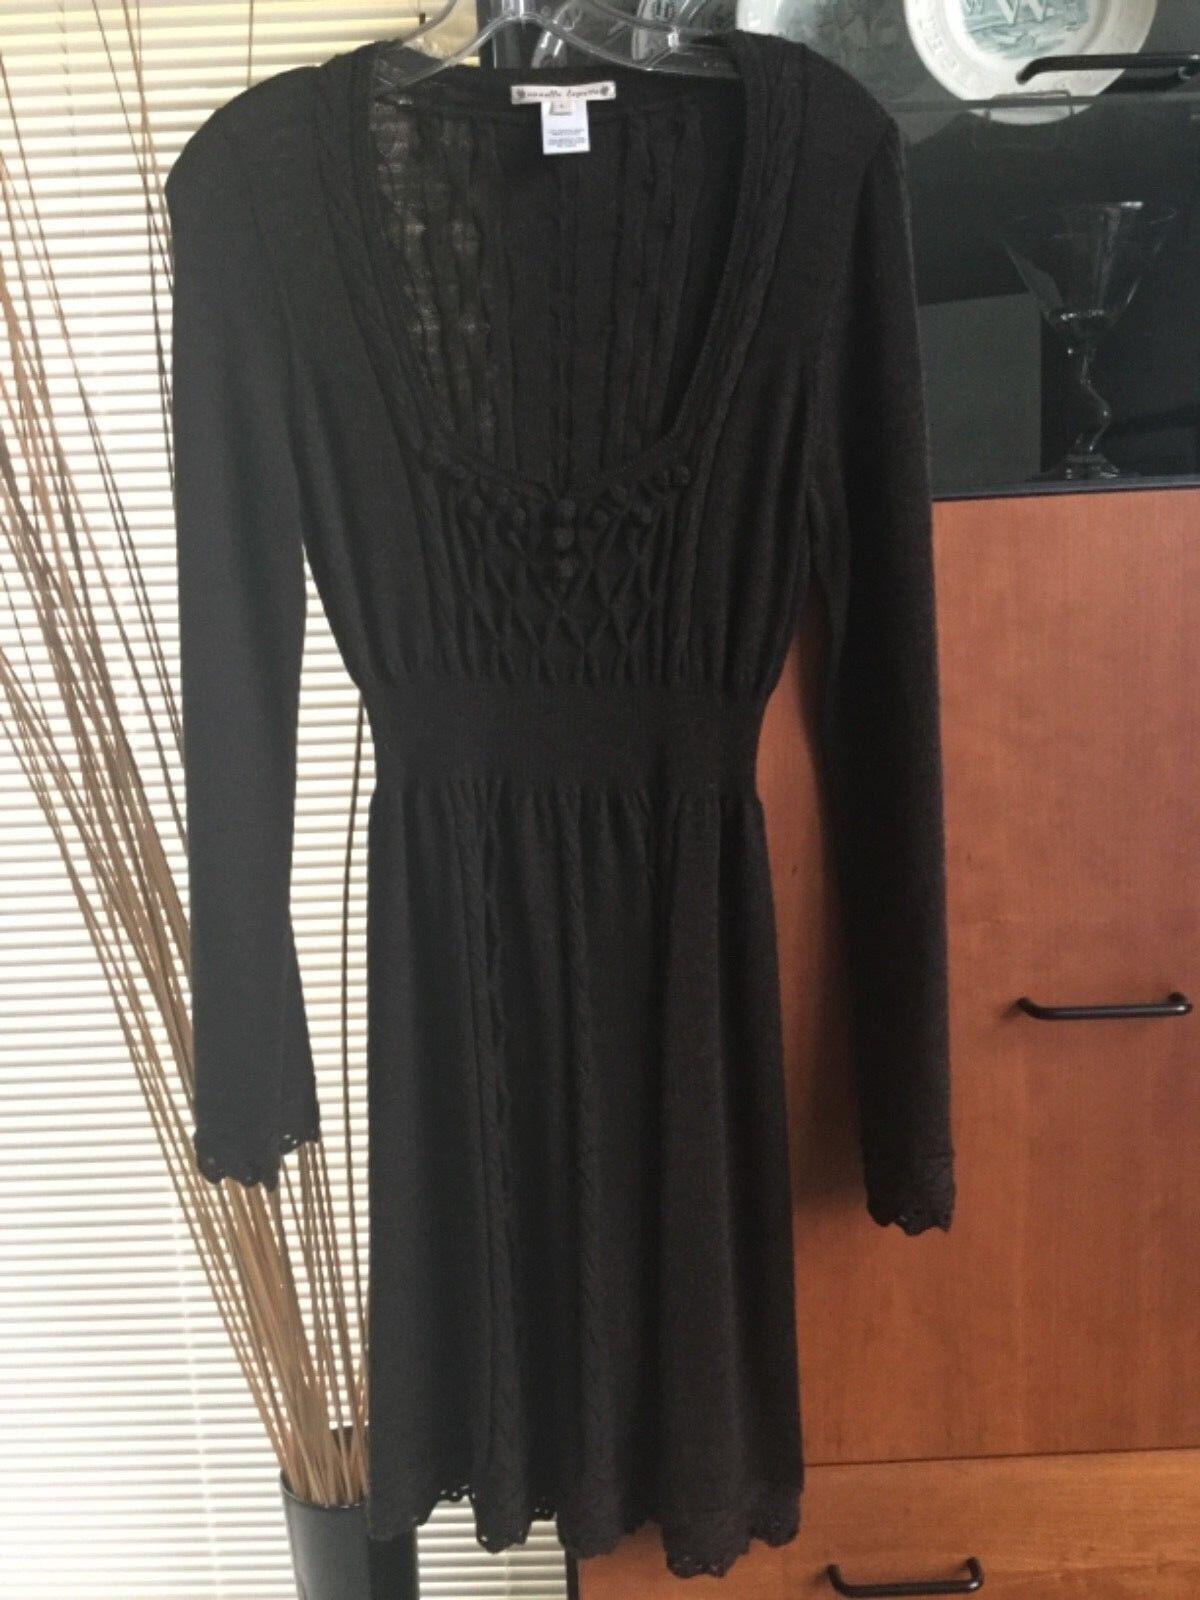 NWOT Nanette Lepore braun knit dress Größe S cabled merino wool